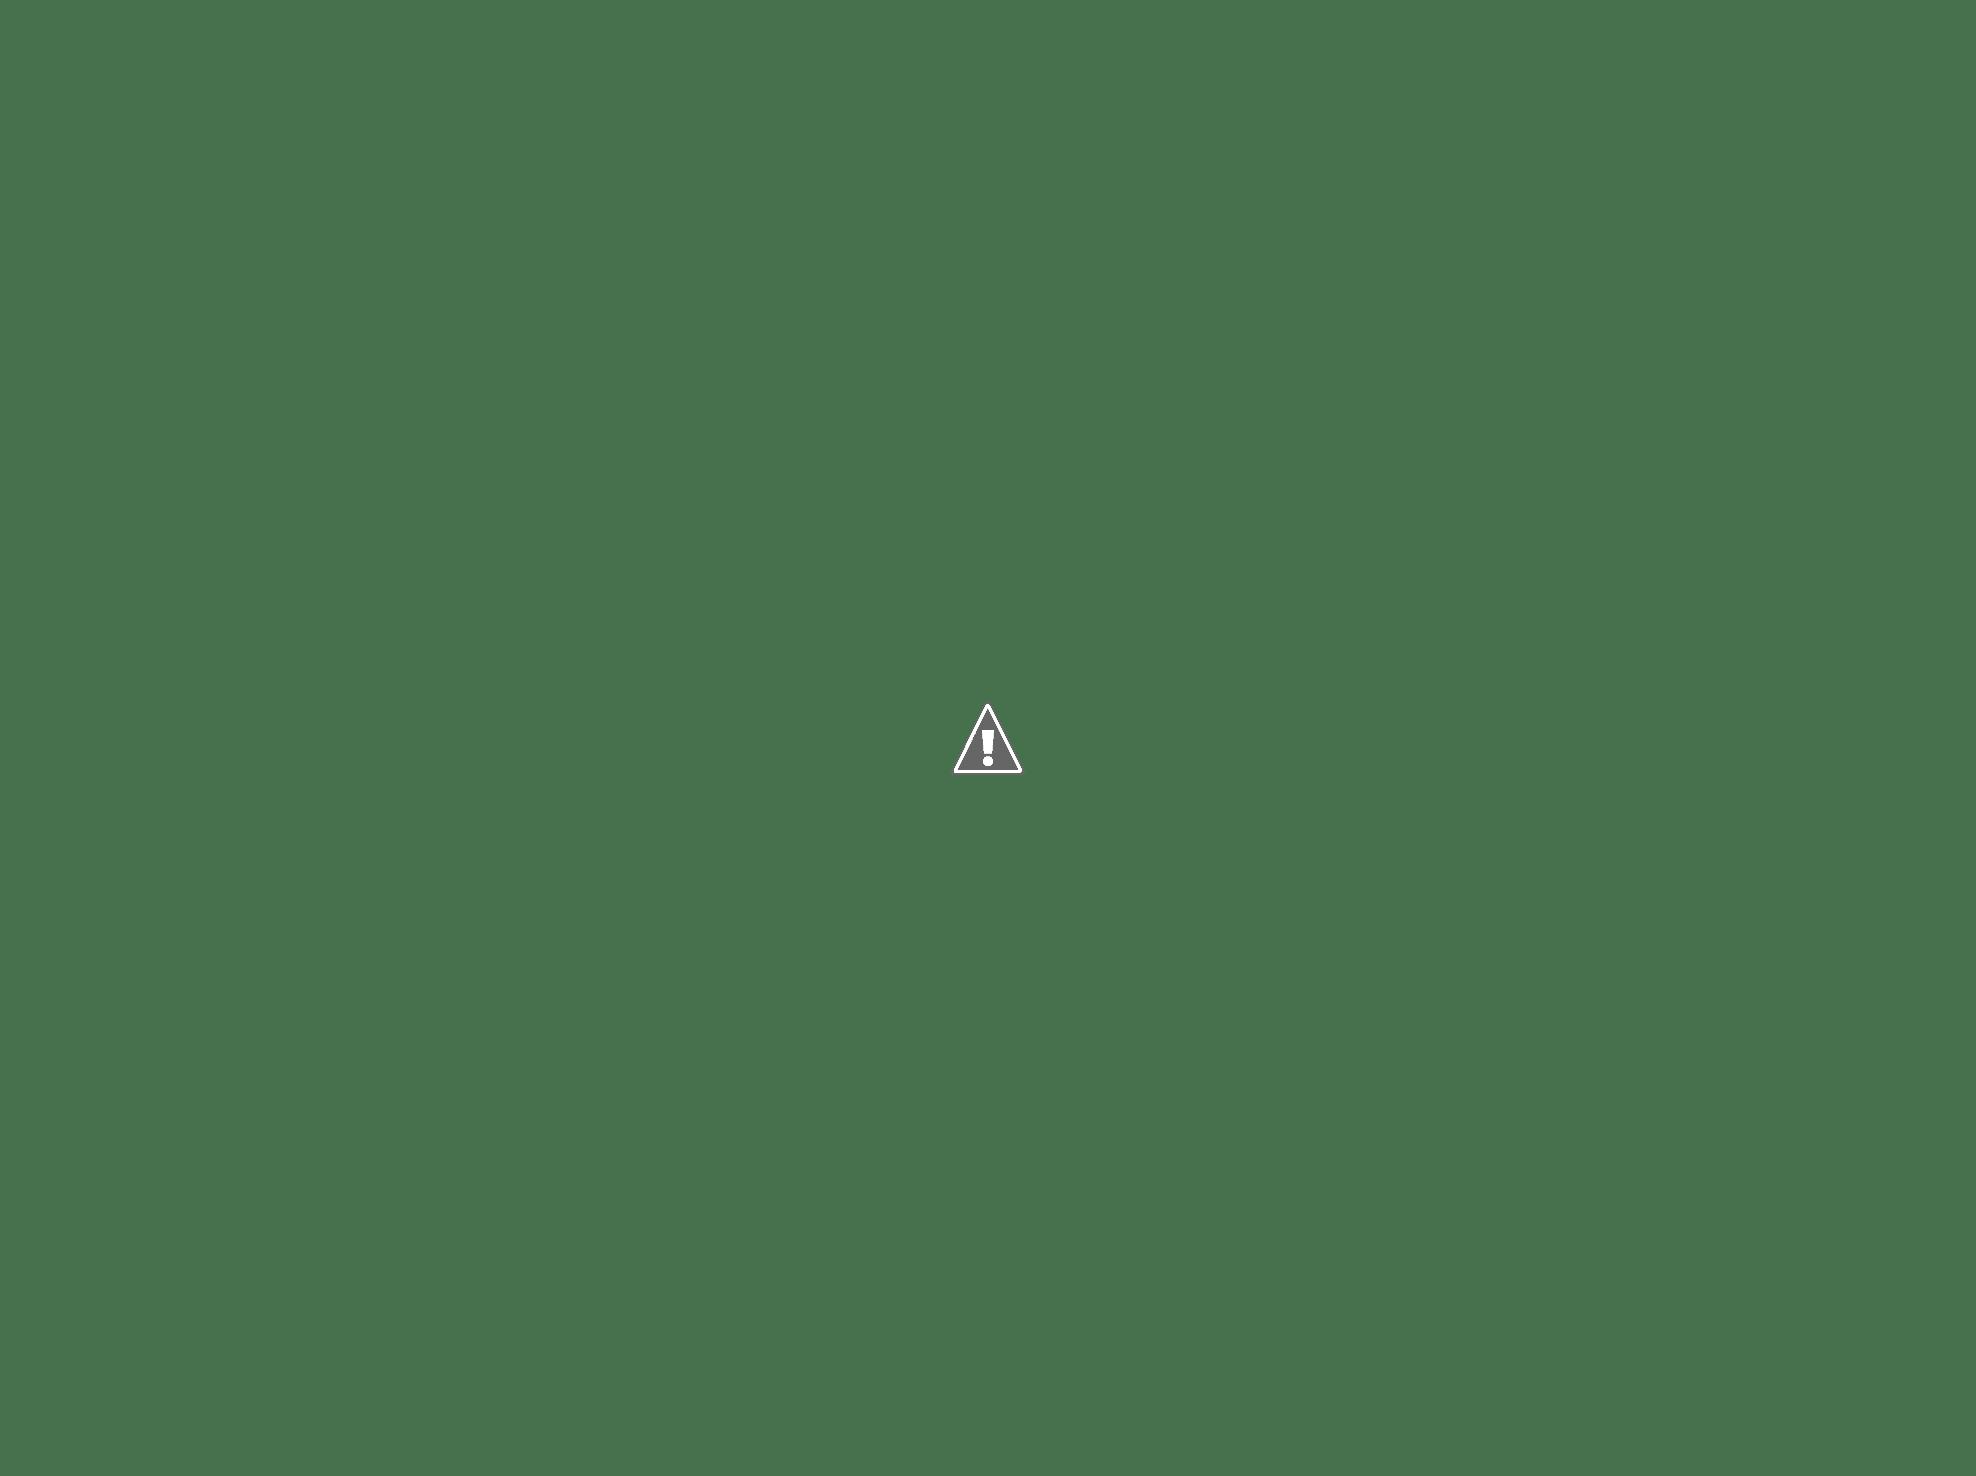 RvMenu - Simple Laravel menu manager